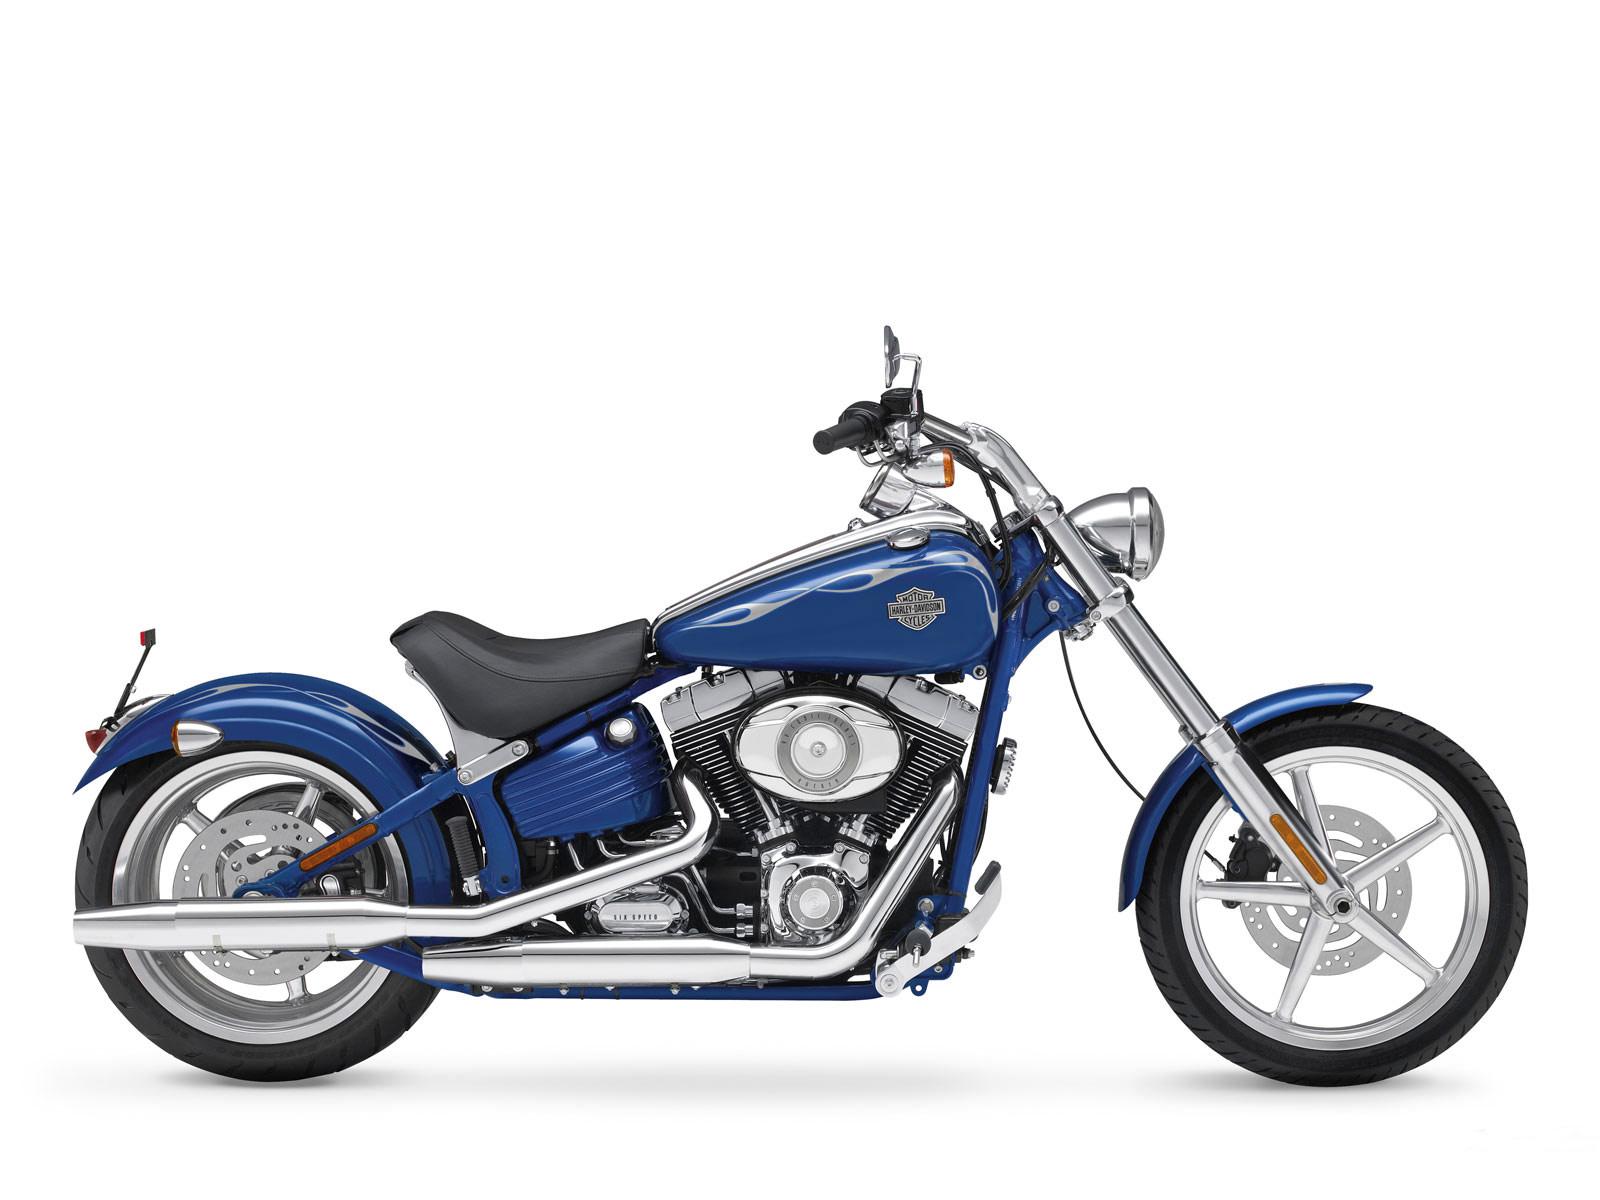 Harley Davidson Rocker Specs